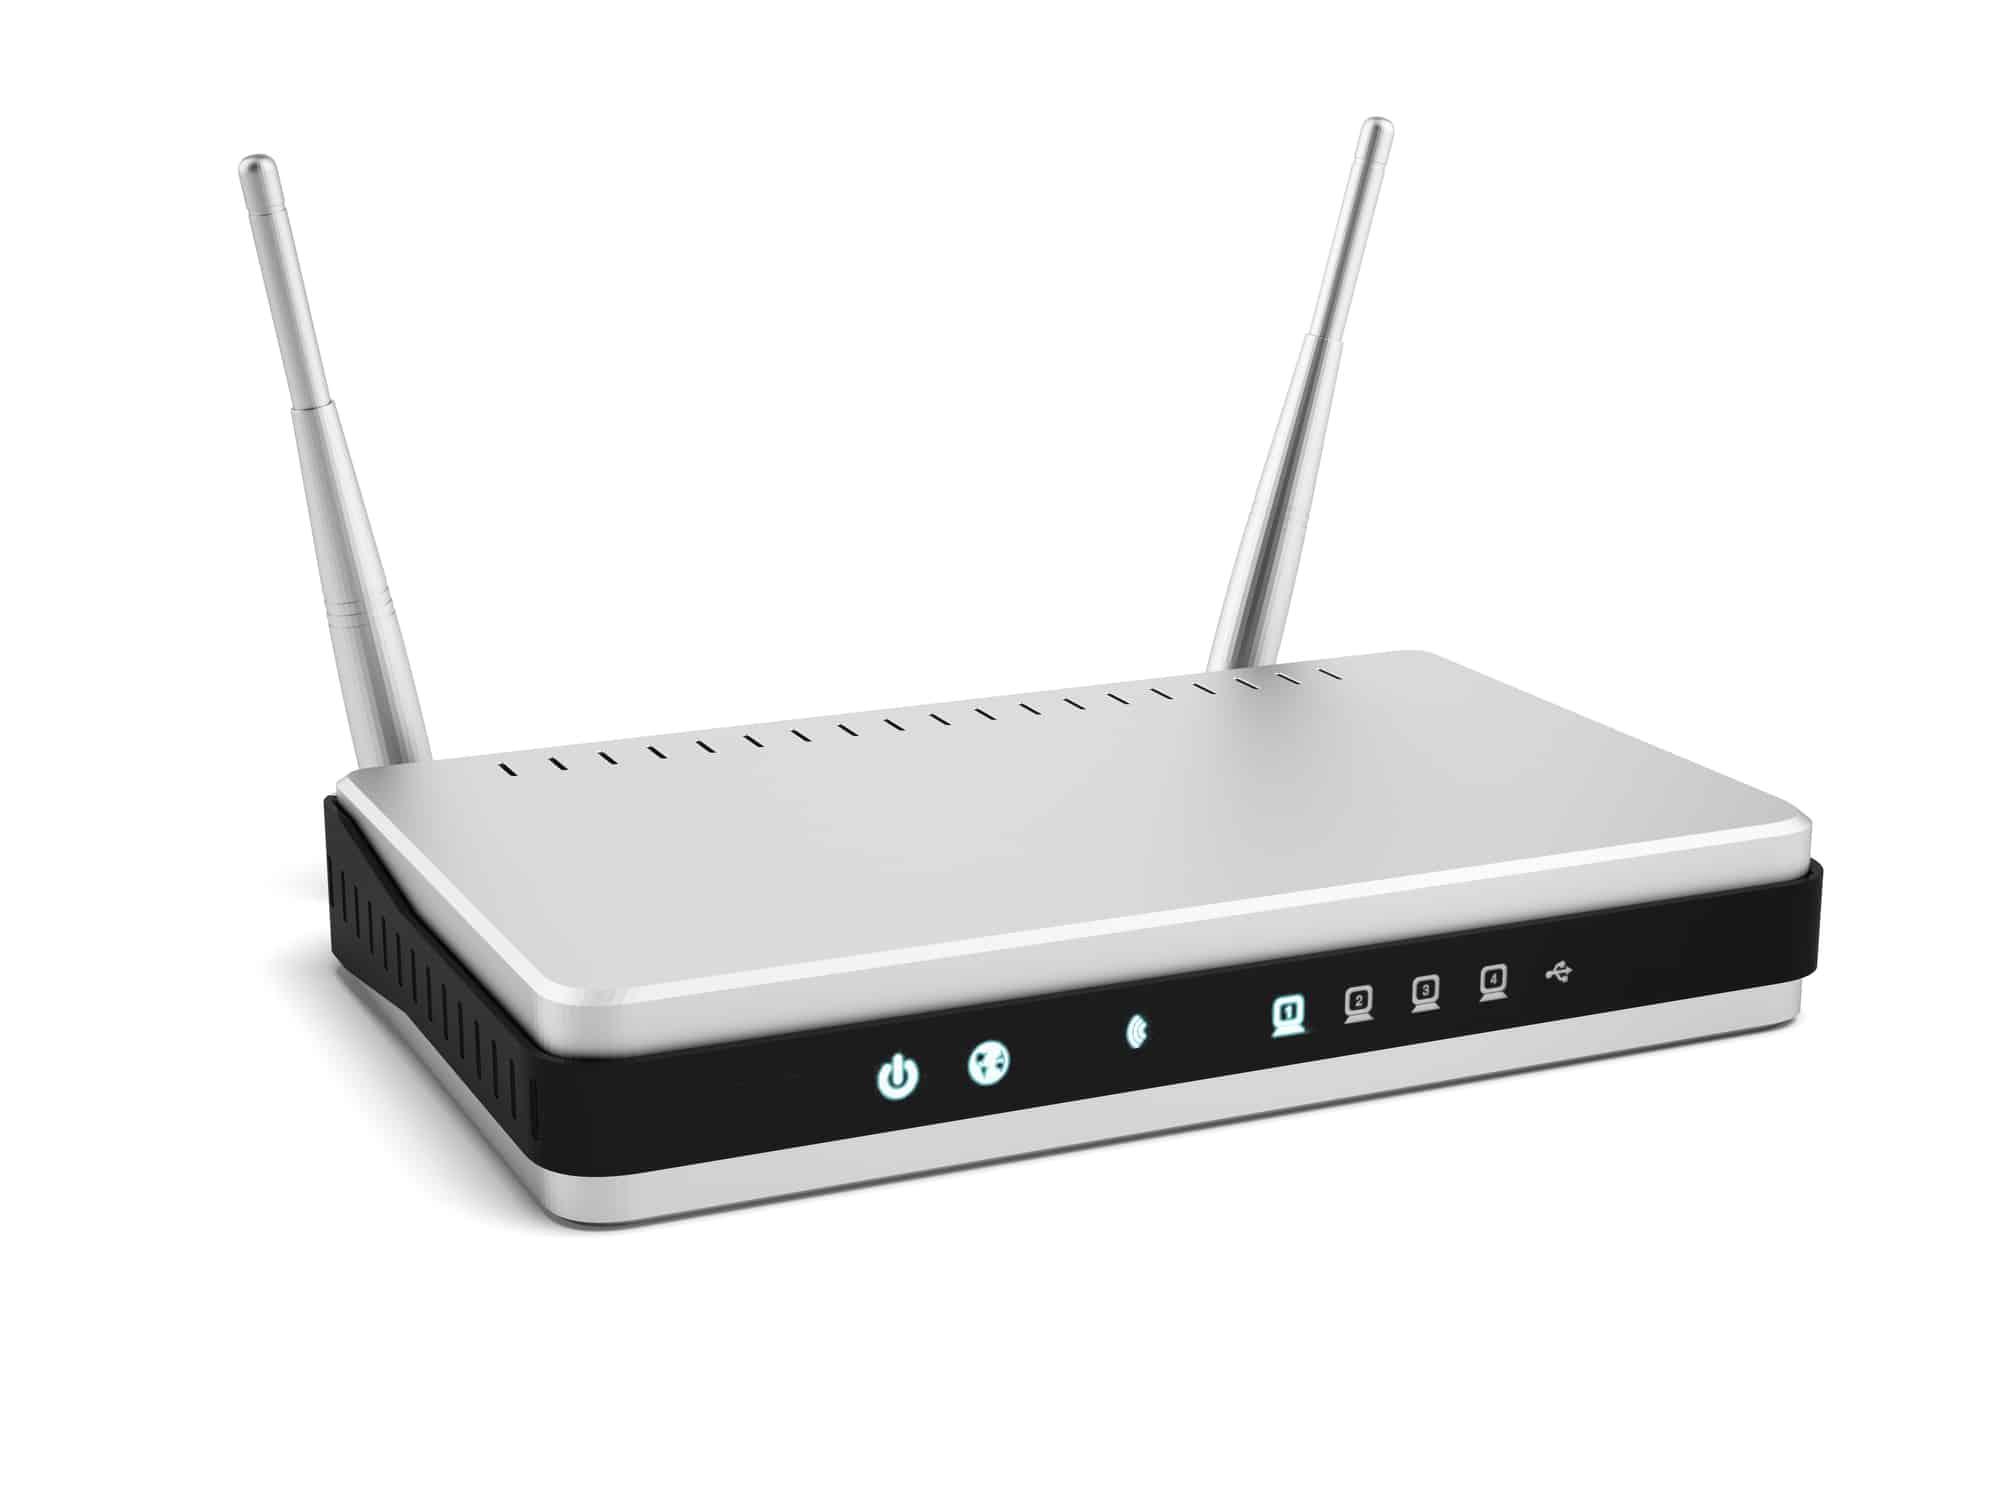 Linksys Velop vs Netgear Orbi Tested | WiFi Mesh System Comparison